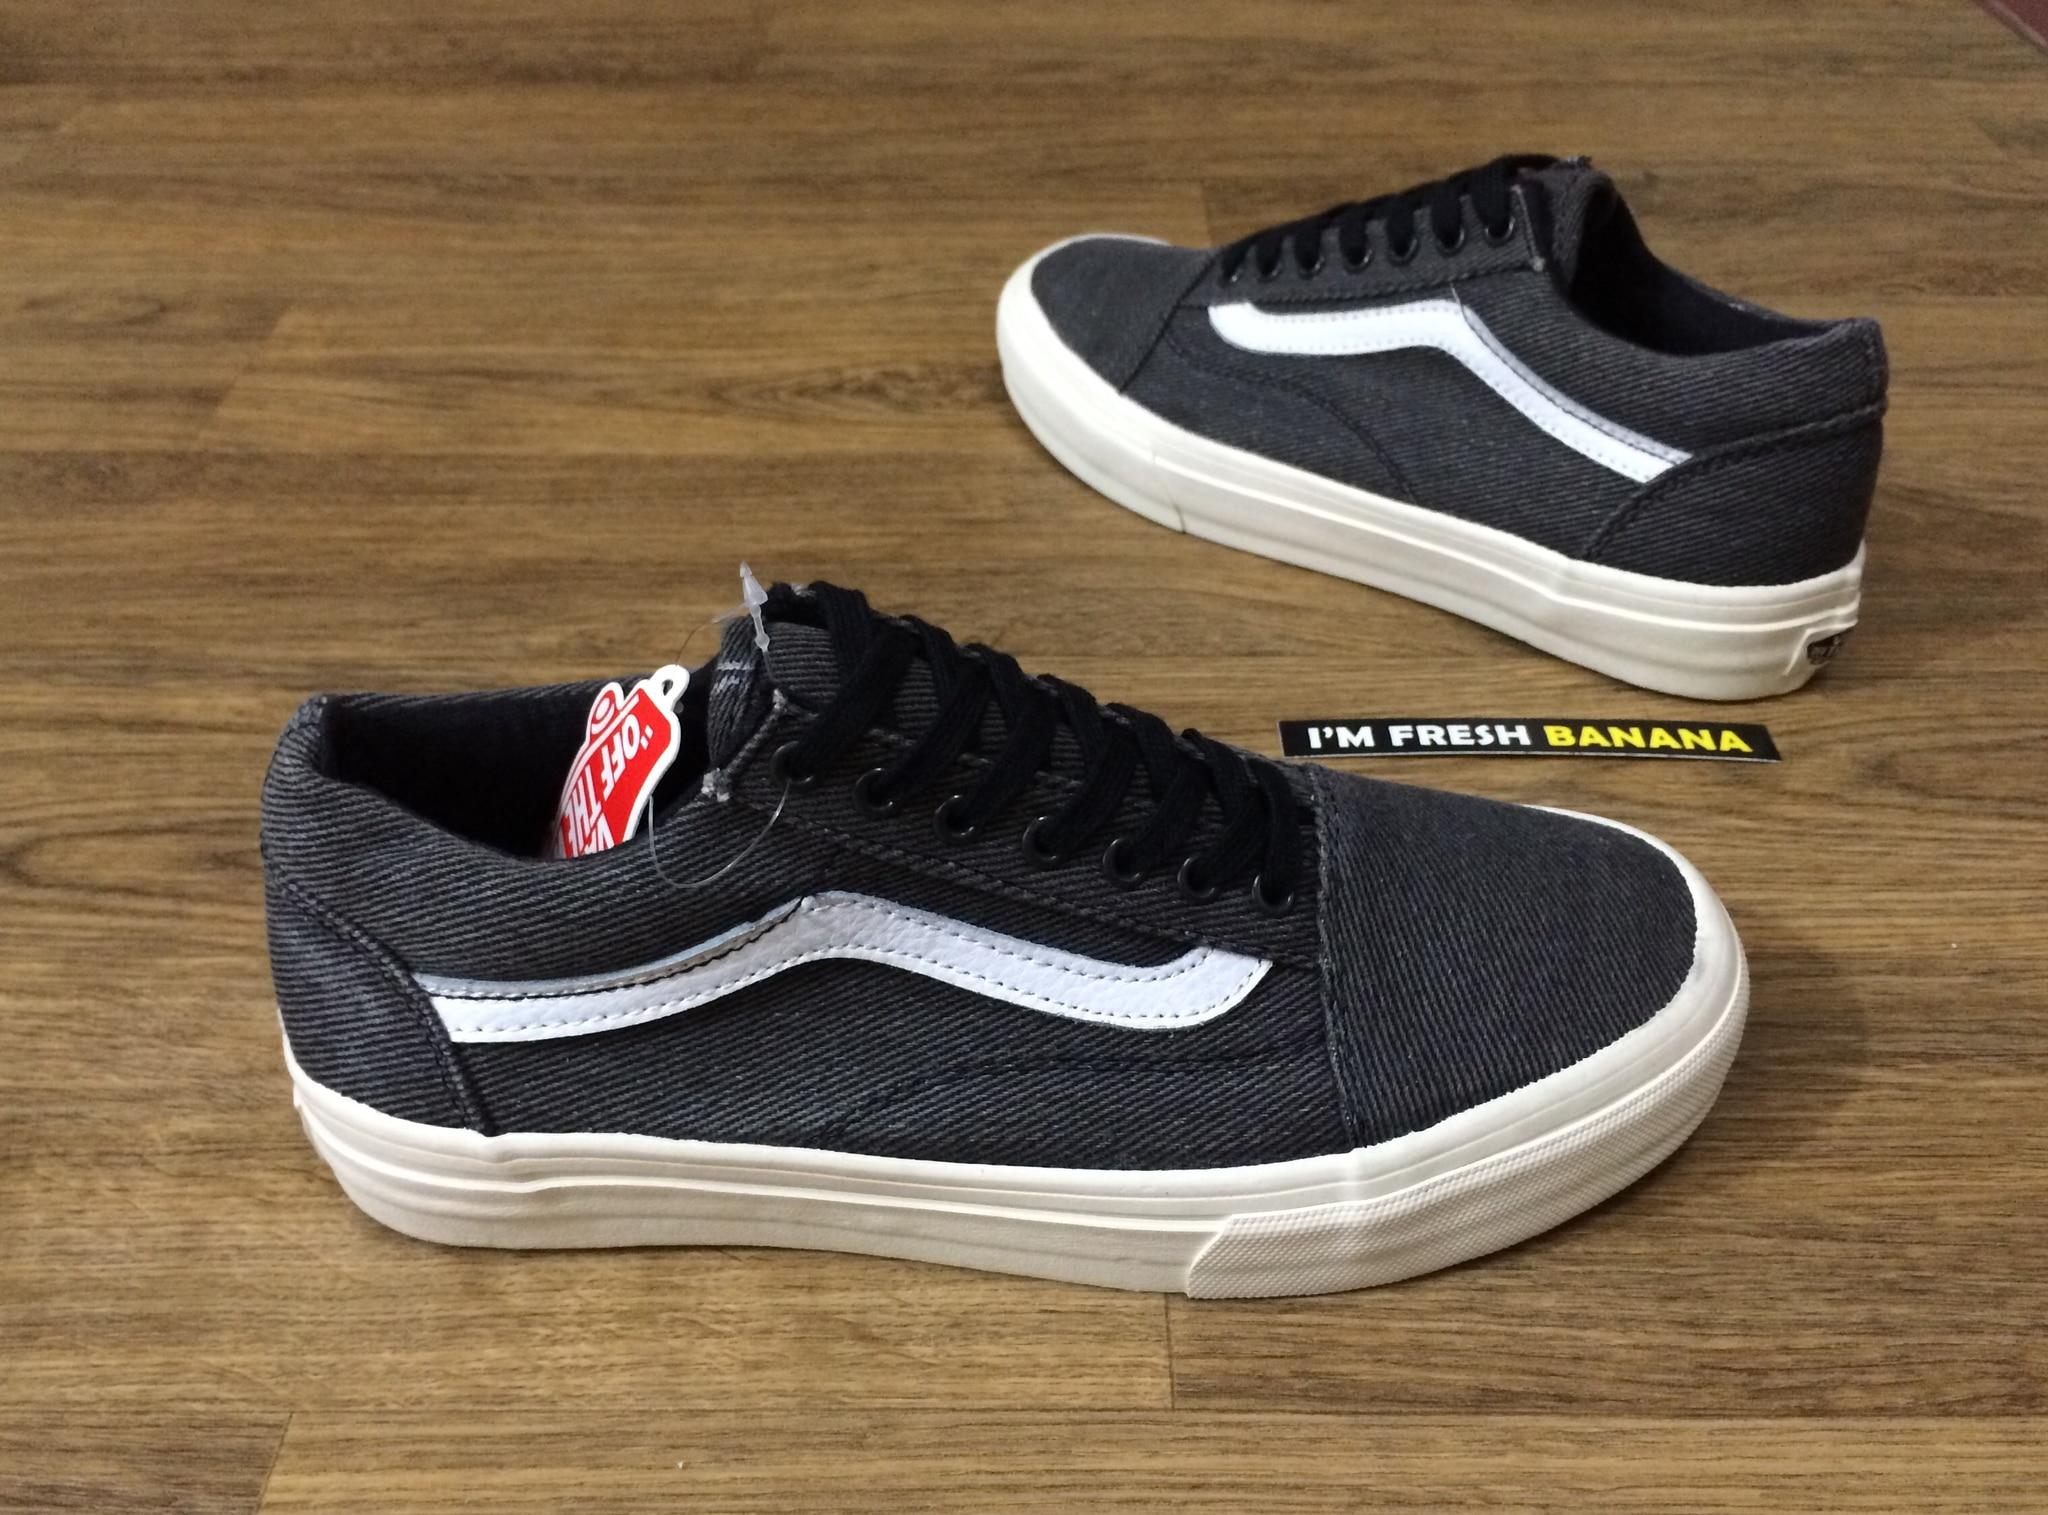 Jual Sepatu Vans Old Skool Mono Black White IFC Premium oldskool hitam - Fresh Banana   Tokopedia